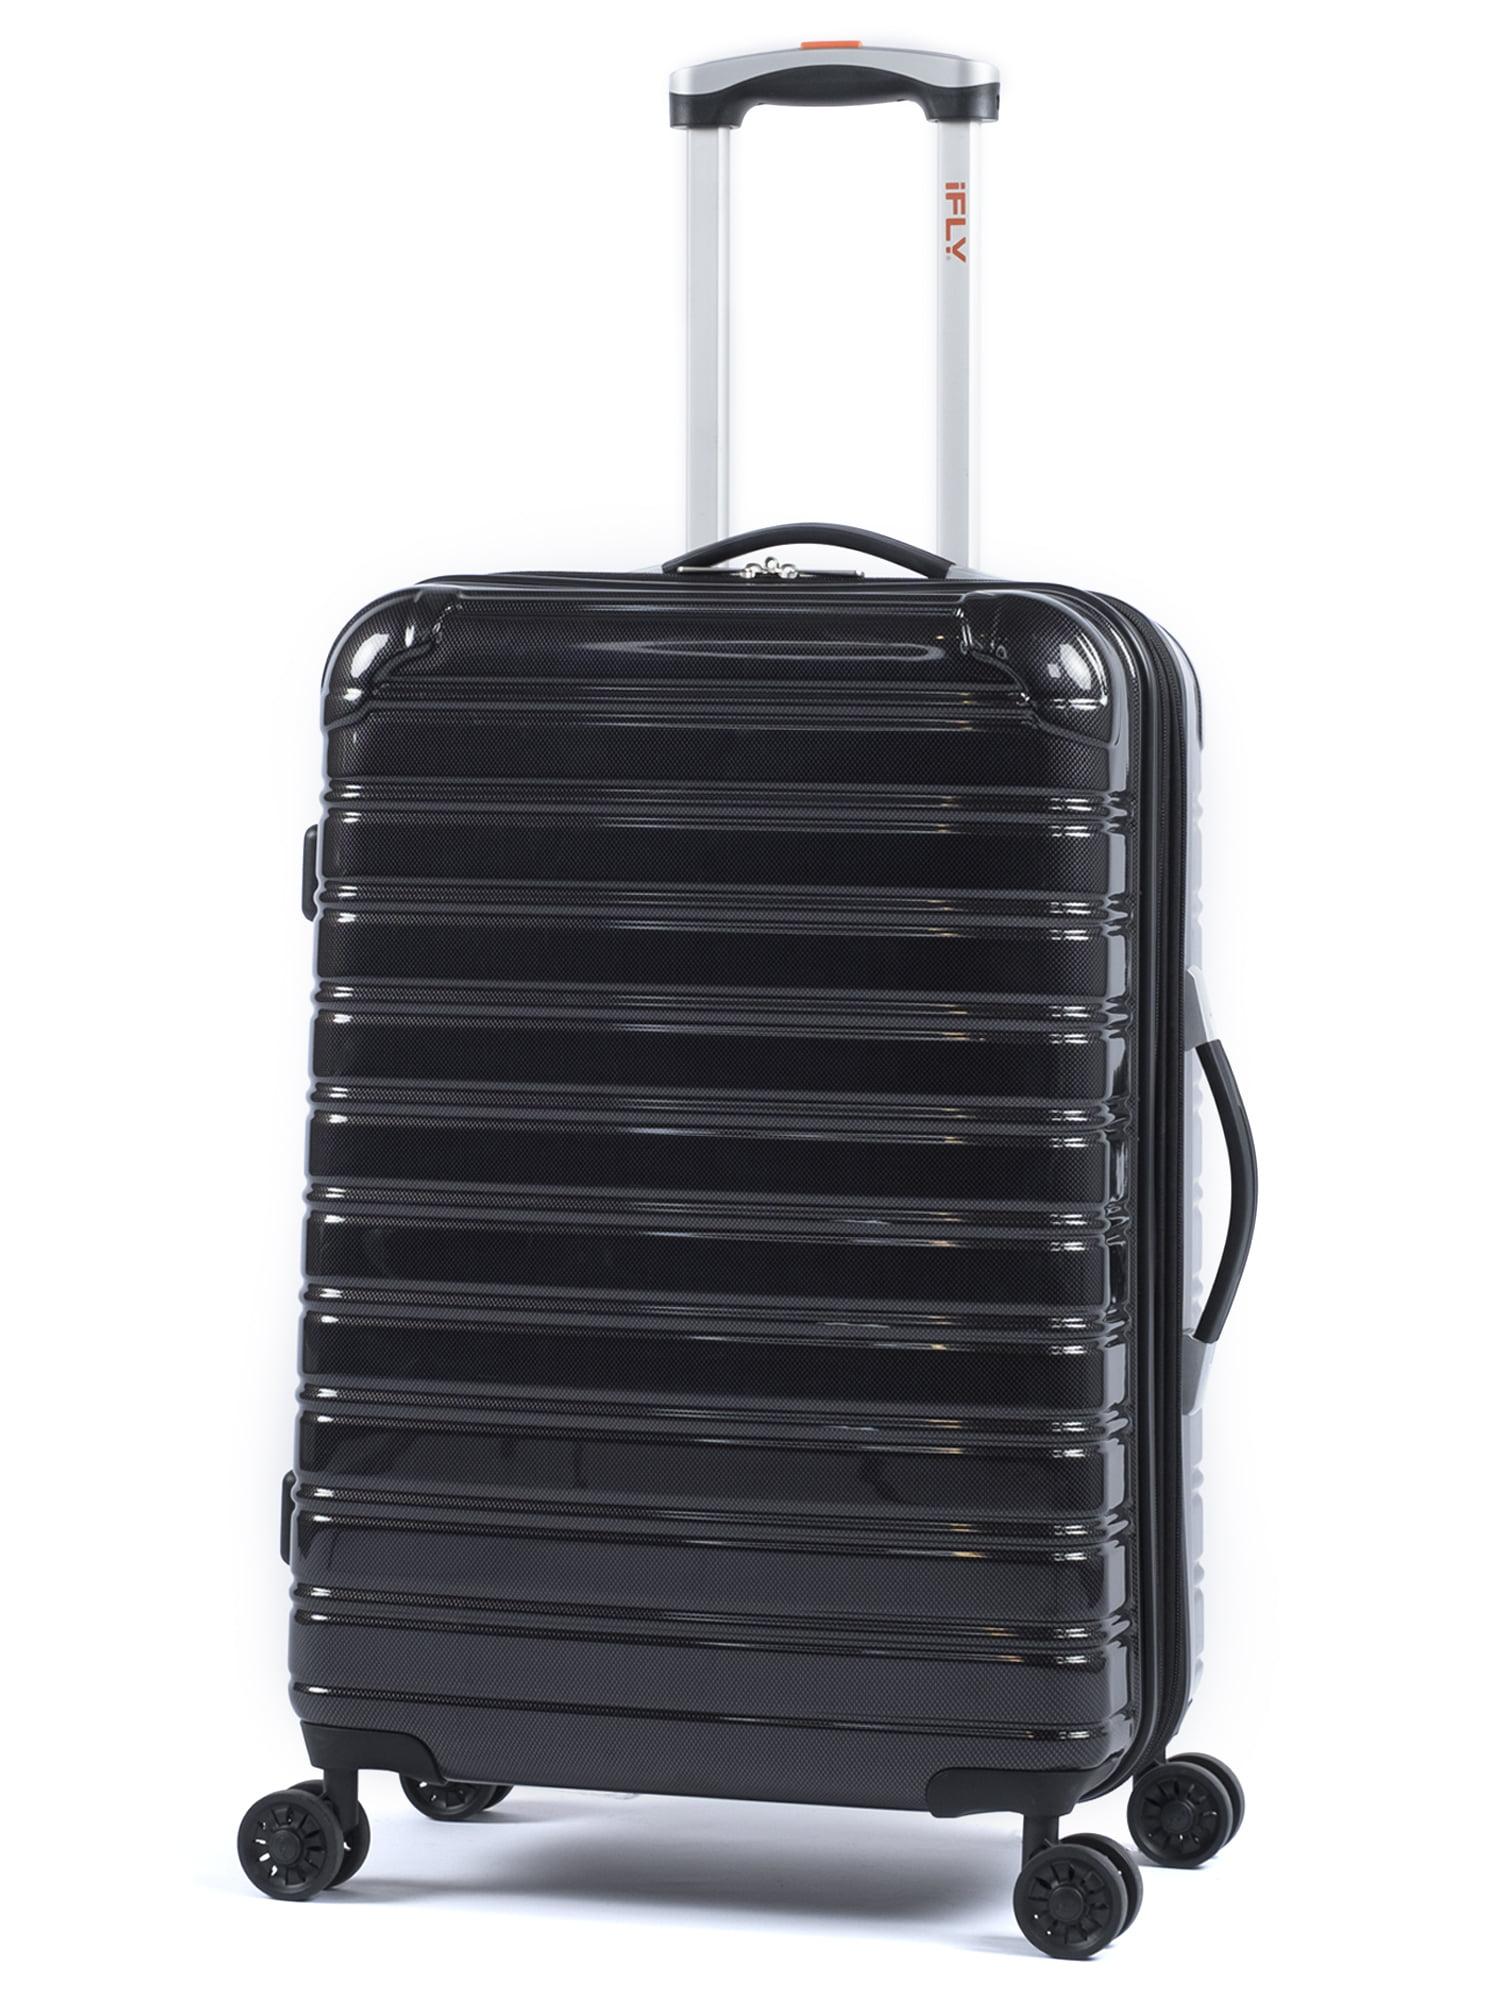 "iFLY Hardside Fibertech Luggage 24"" Checked Luggage"